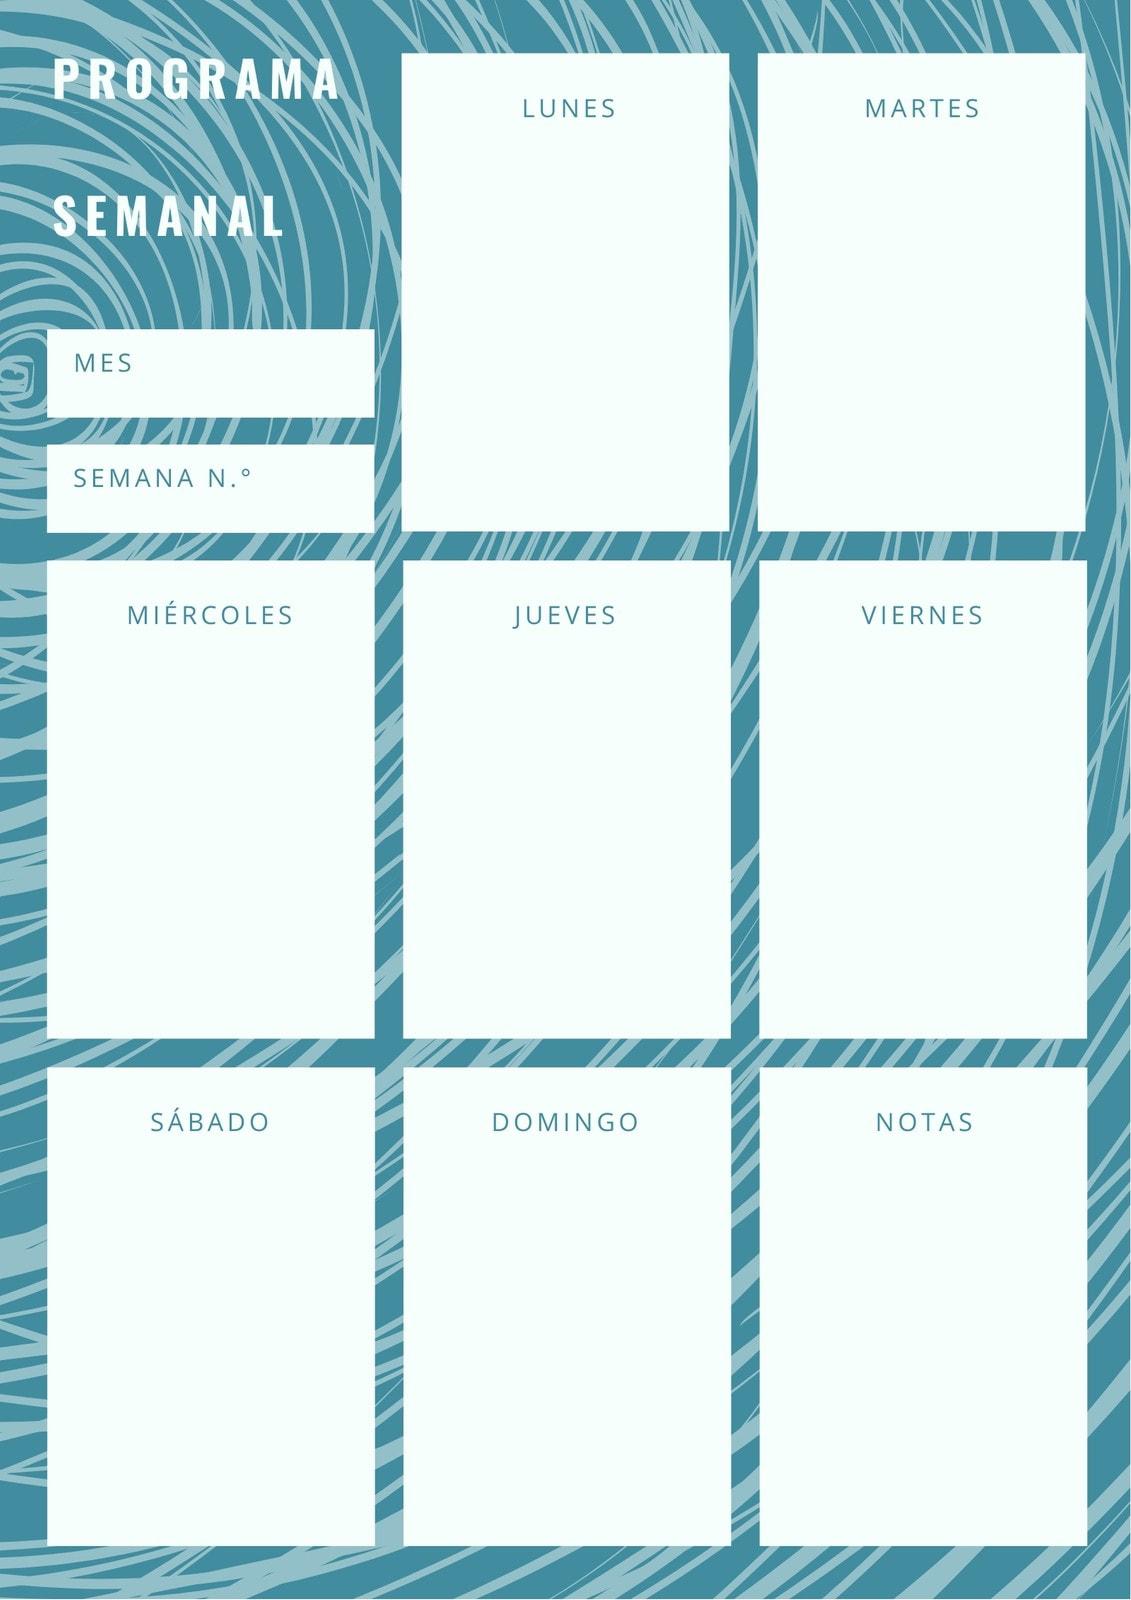 Azul Patrón de Olas Horario Semanal Planificador